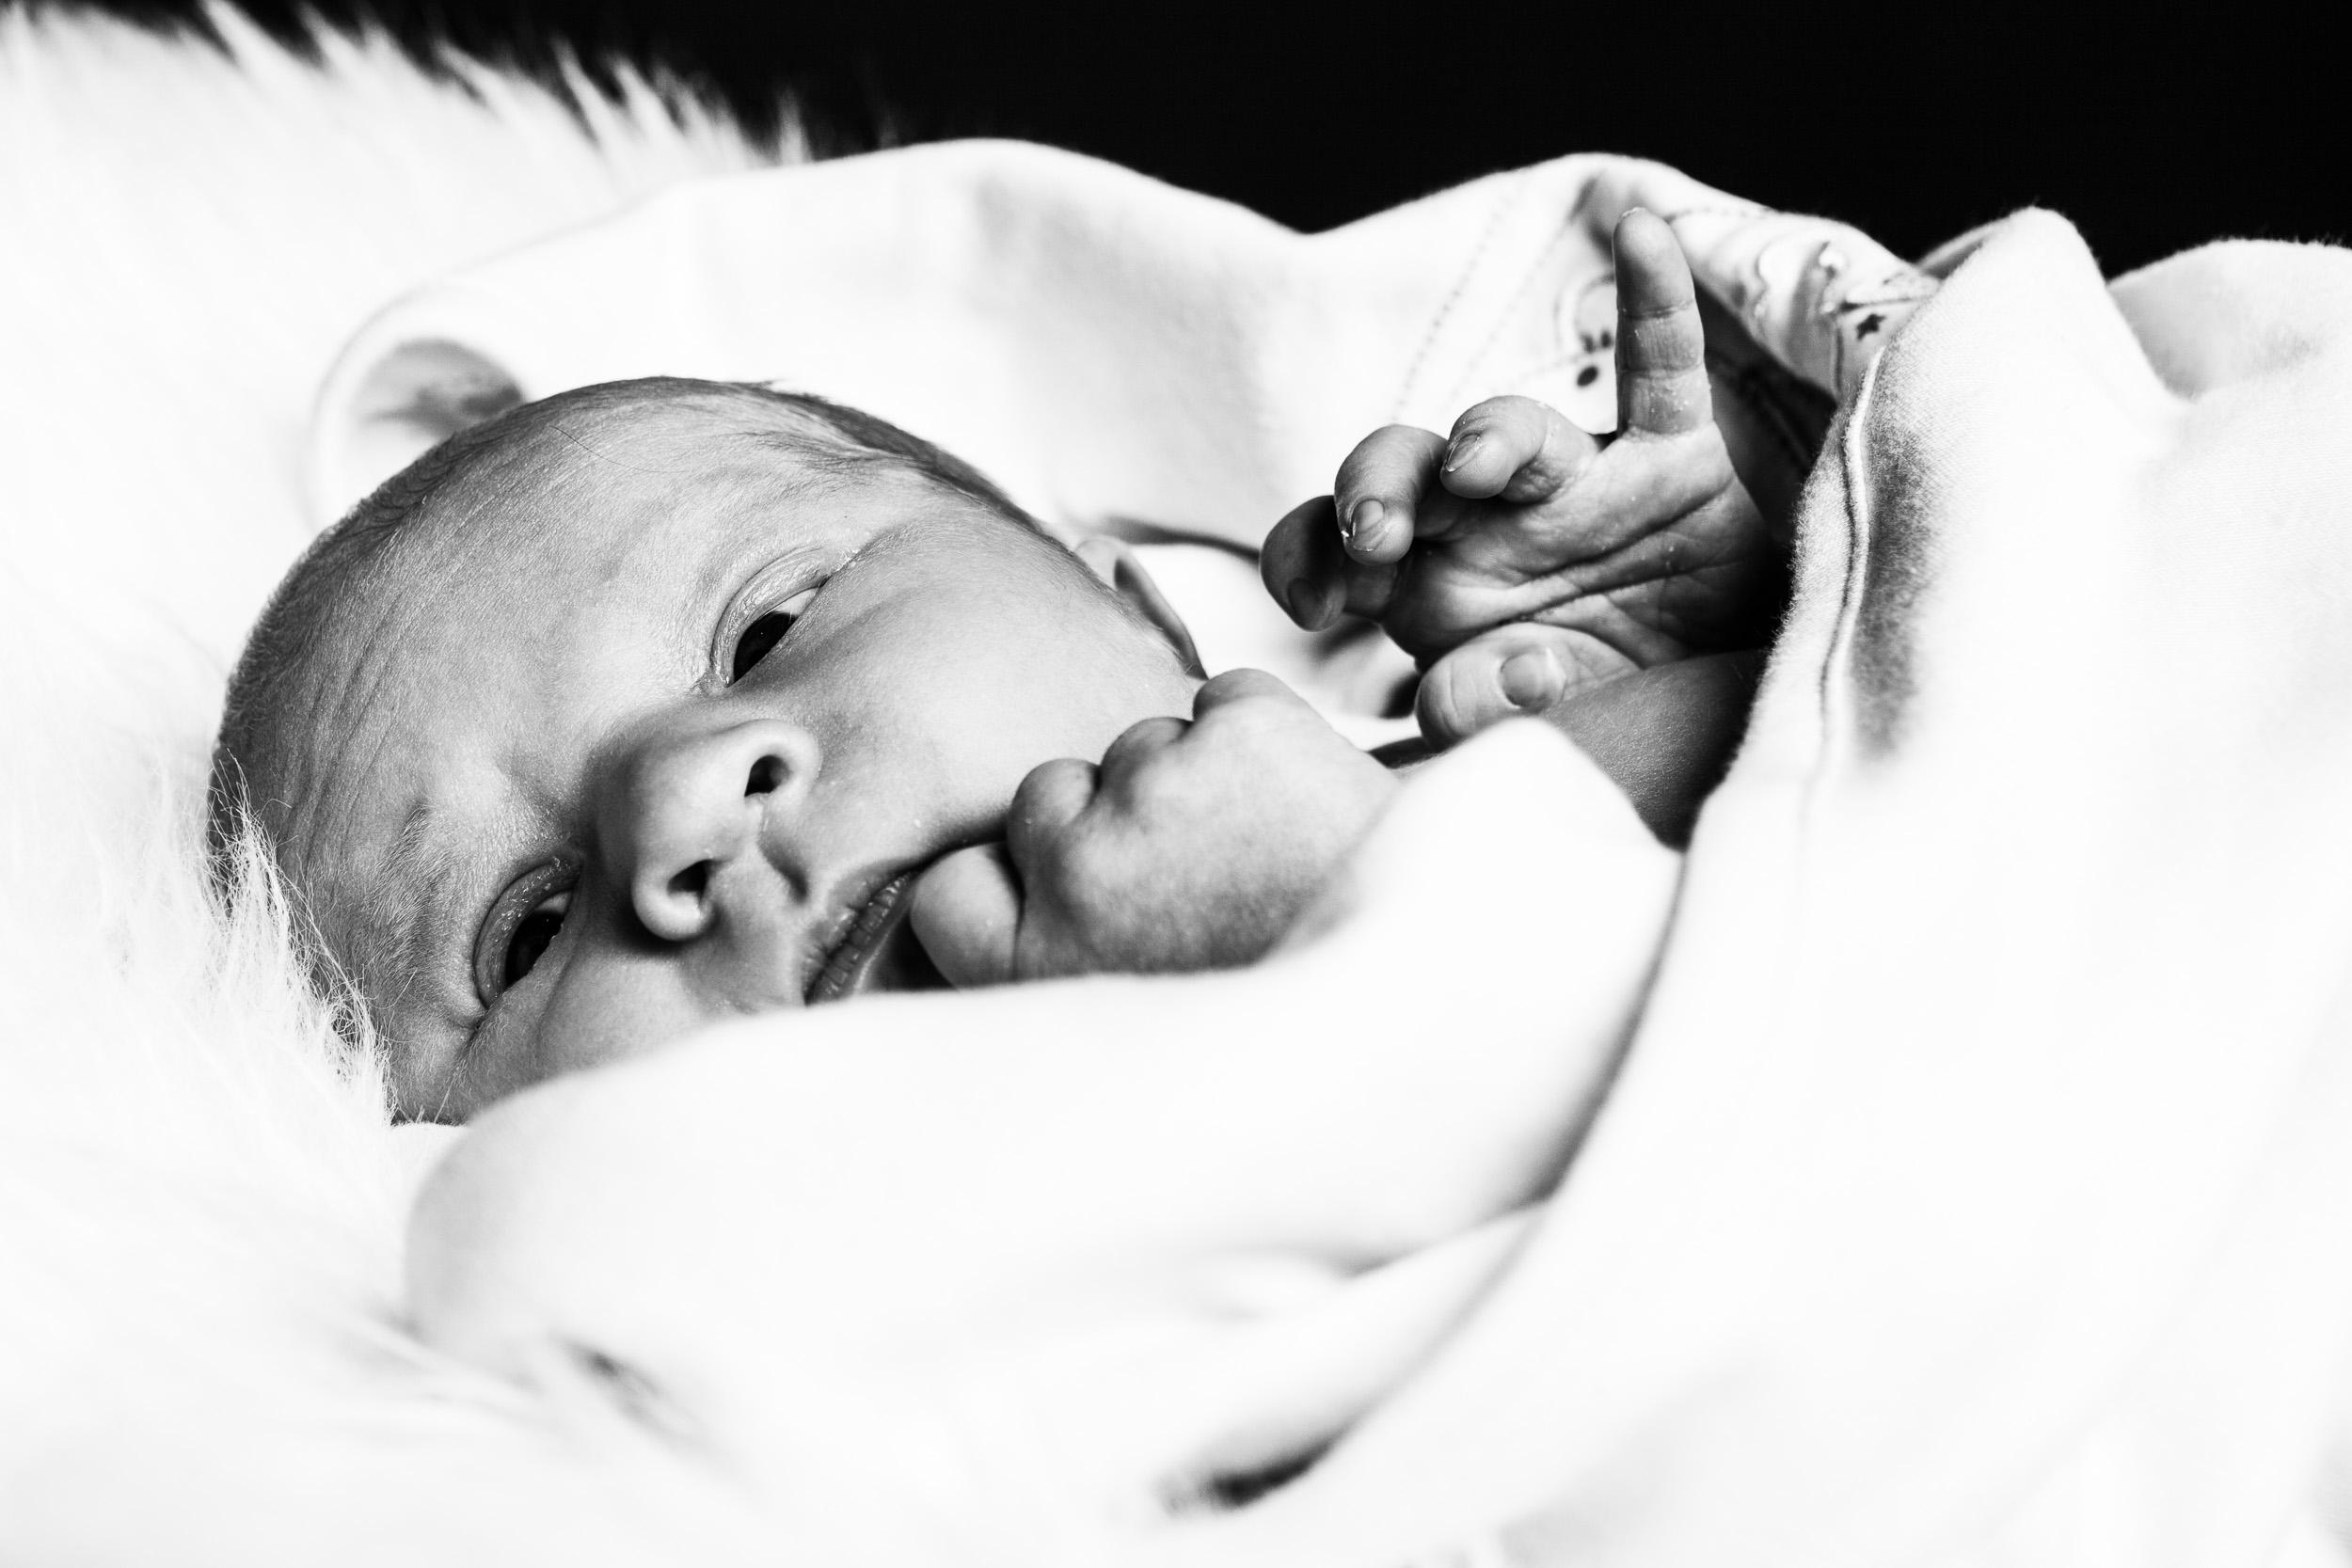 Perhekuvaus-lapsikuvaus-vauvakuvaus-raskaus-valokuvaaja-helsinki-alejandro lorenzo-014.jpg